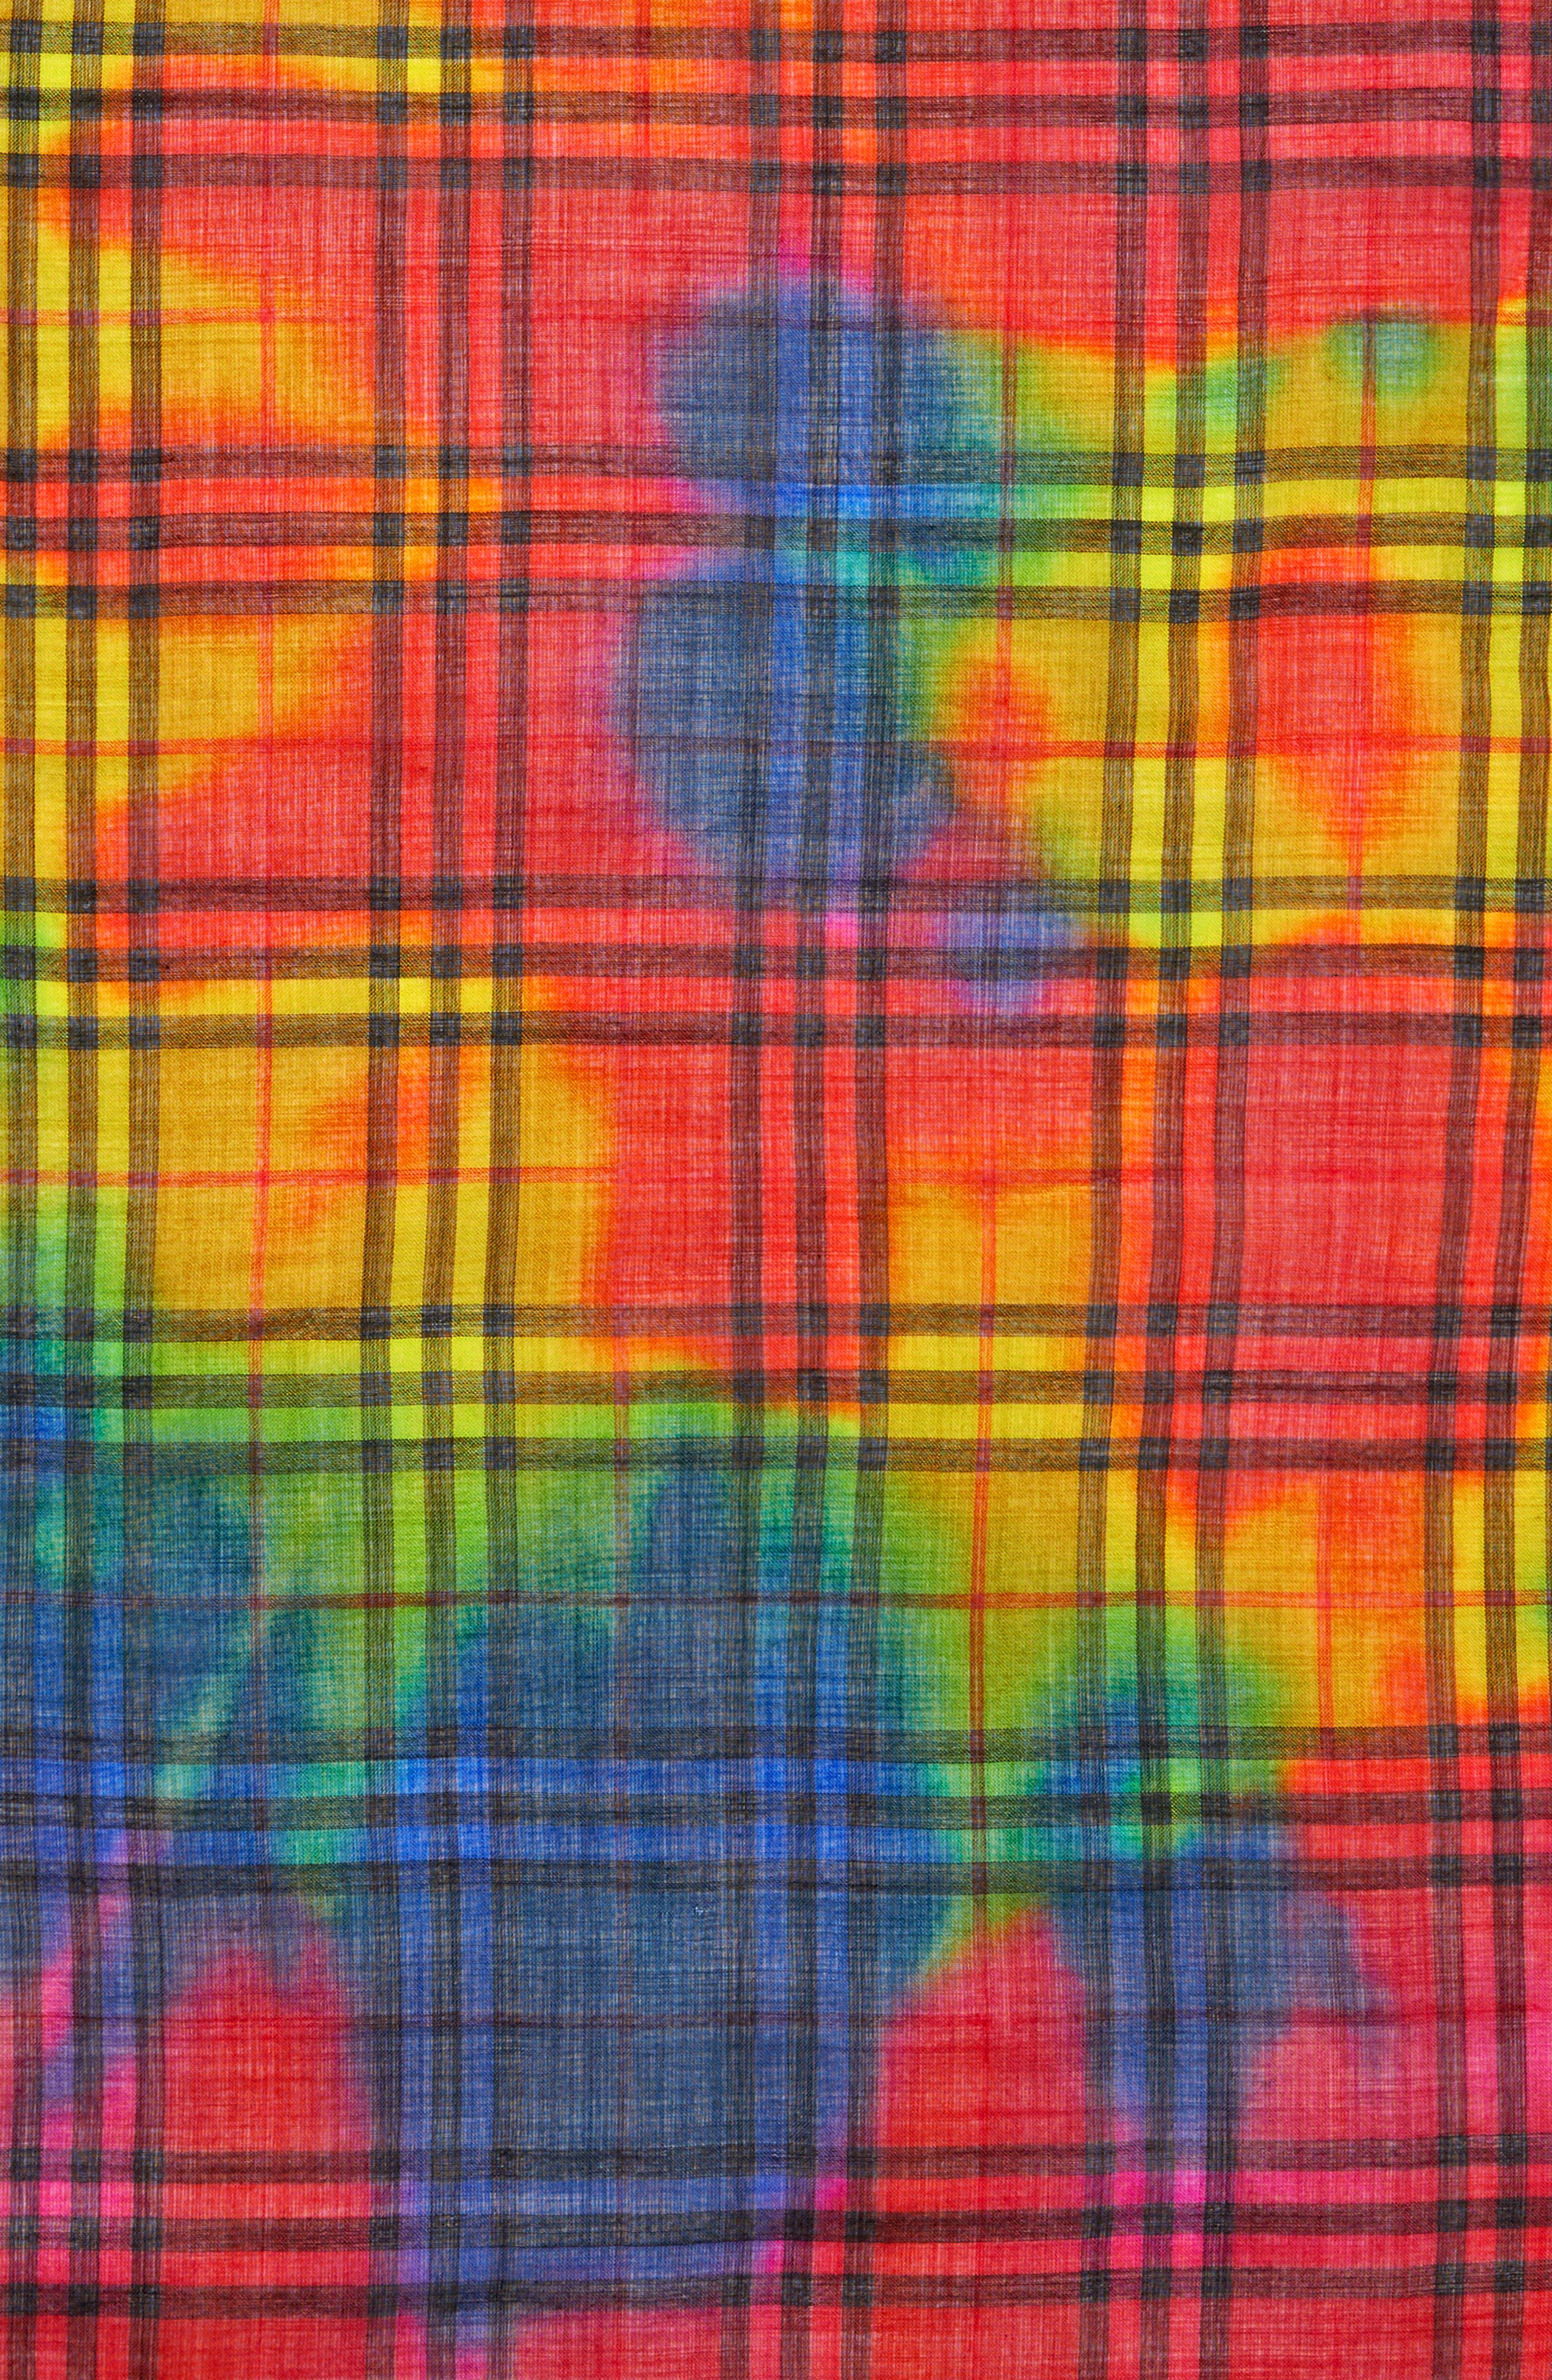 Rainbow Tie Dye Vintage Check Wool & Silk Scarf,                             Alternate thumbnail 4, color,                             600